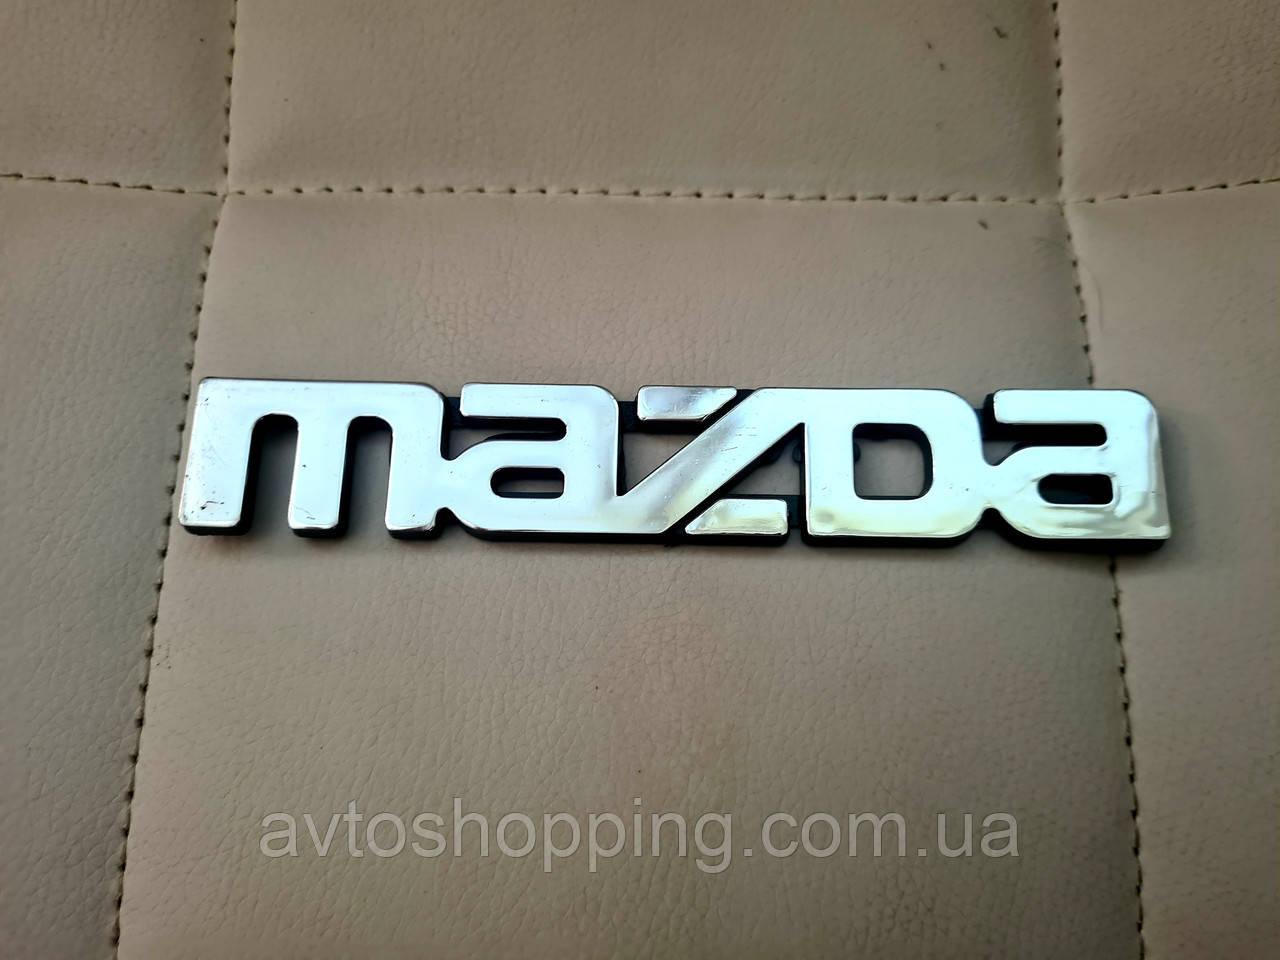 Эмблема значок на багажник, надпись на багажник  Mazda (323-626 (91-97)) (155х25)